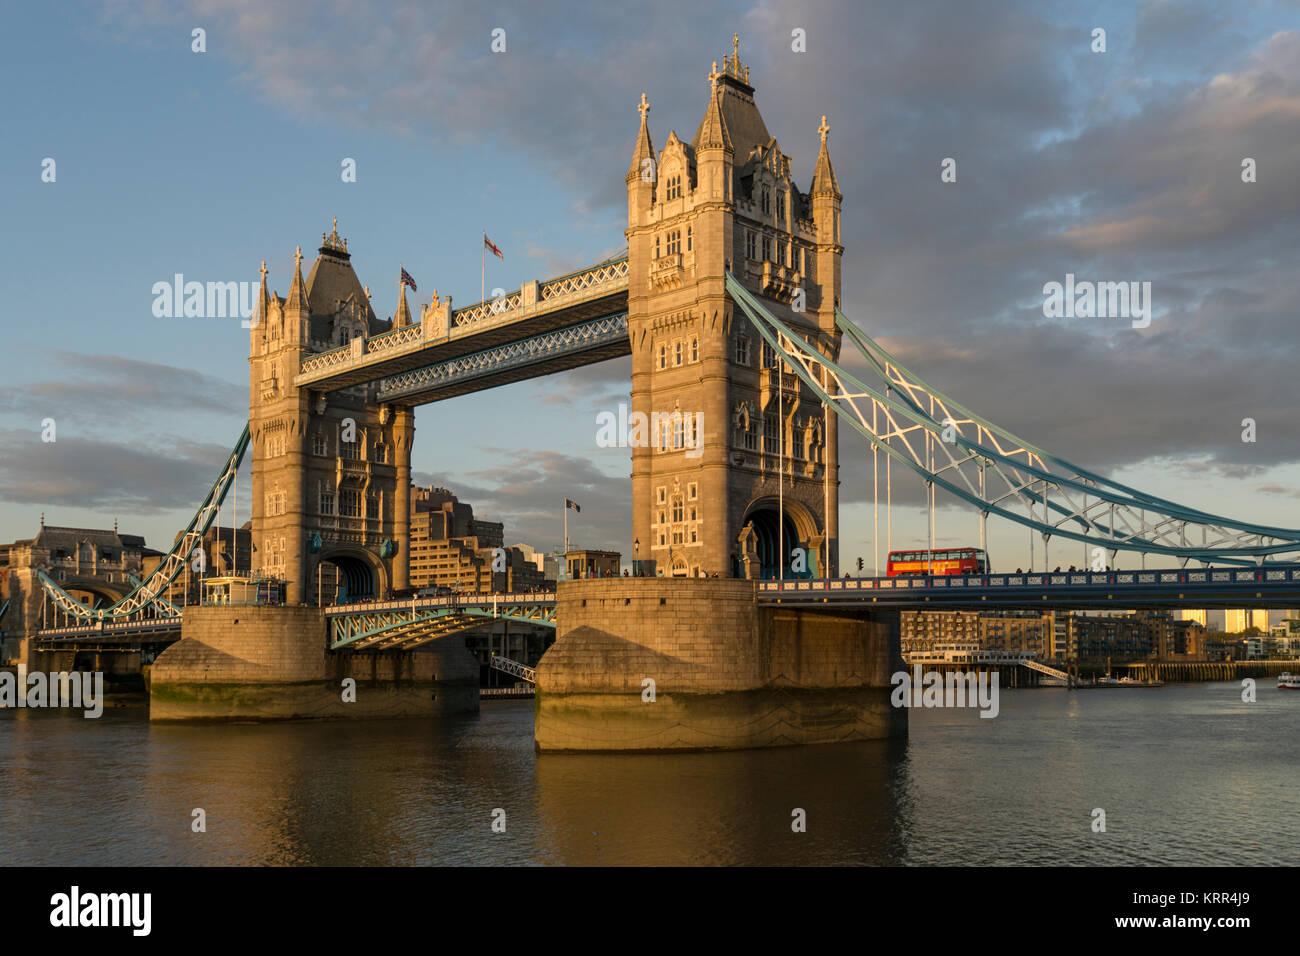 Tower Bridge bei Sonnenuntergang, Themse, London, UK Stockbild